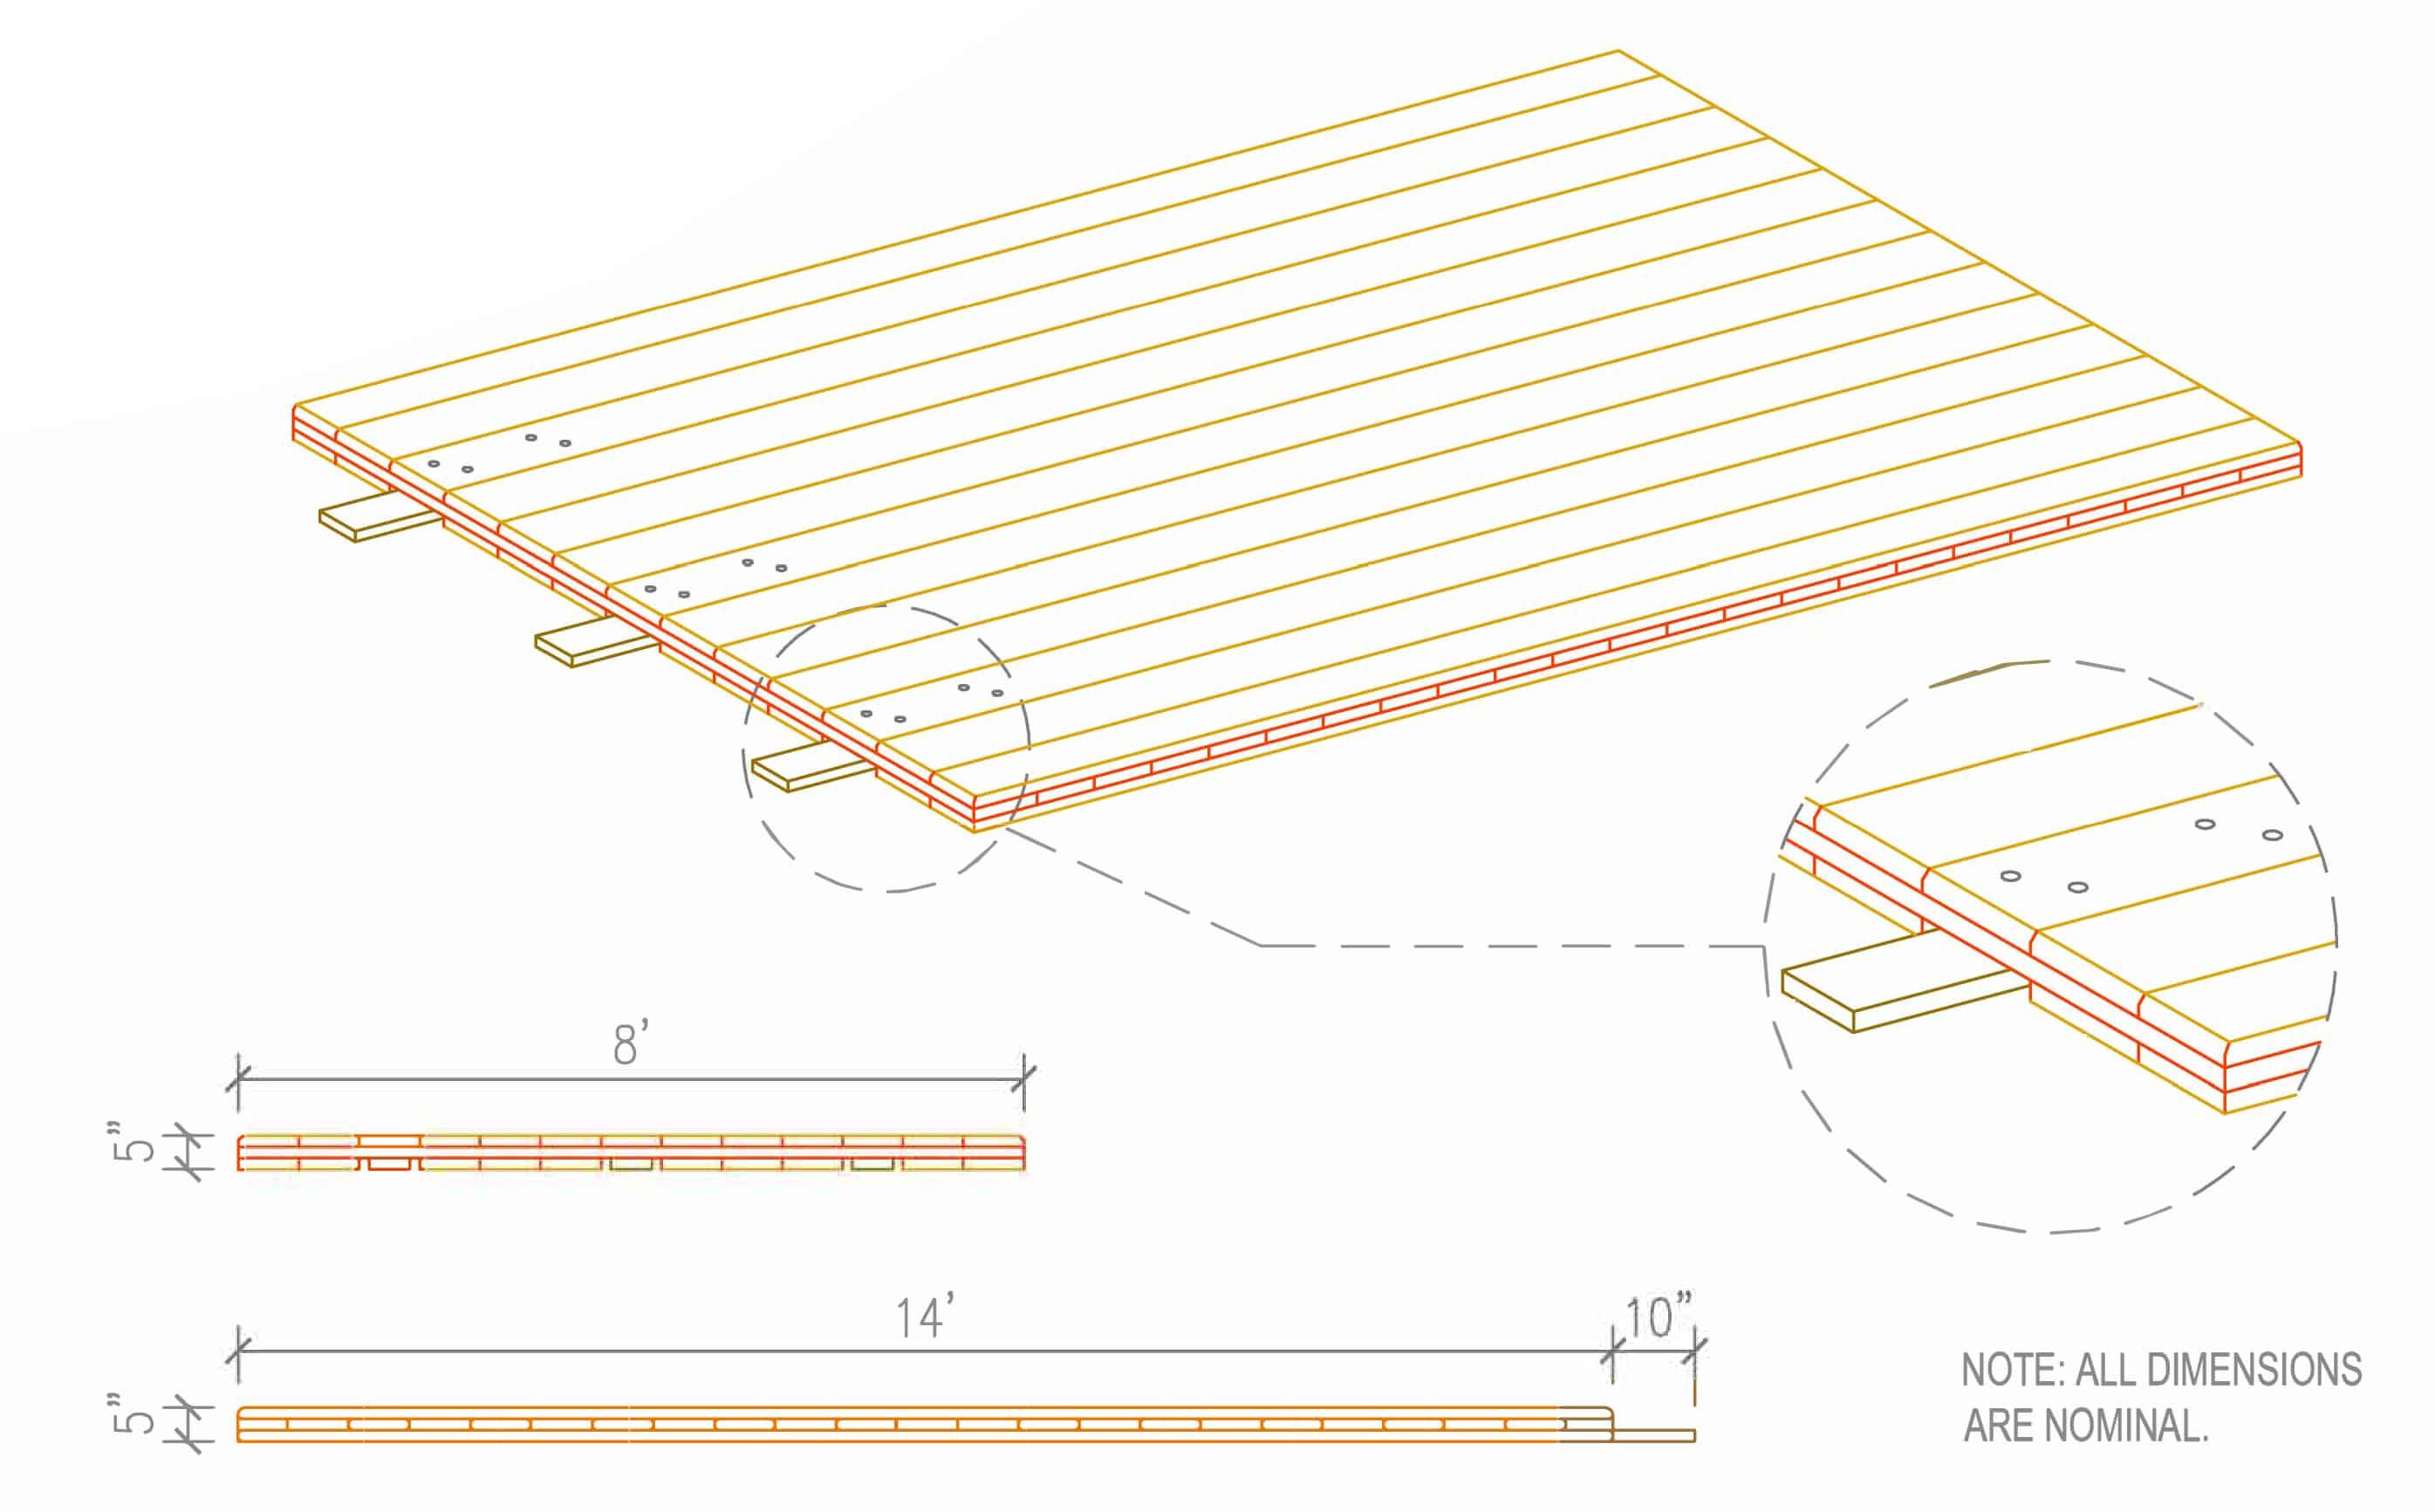 terralam 300 clt access mat